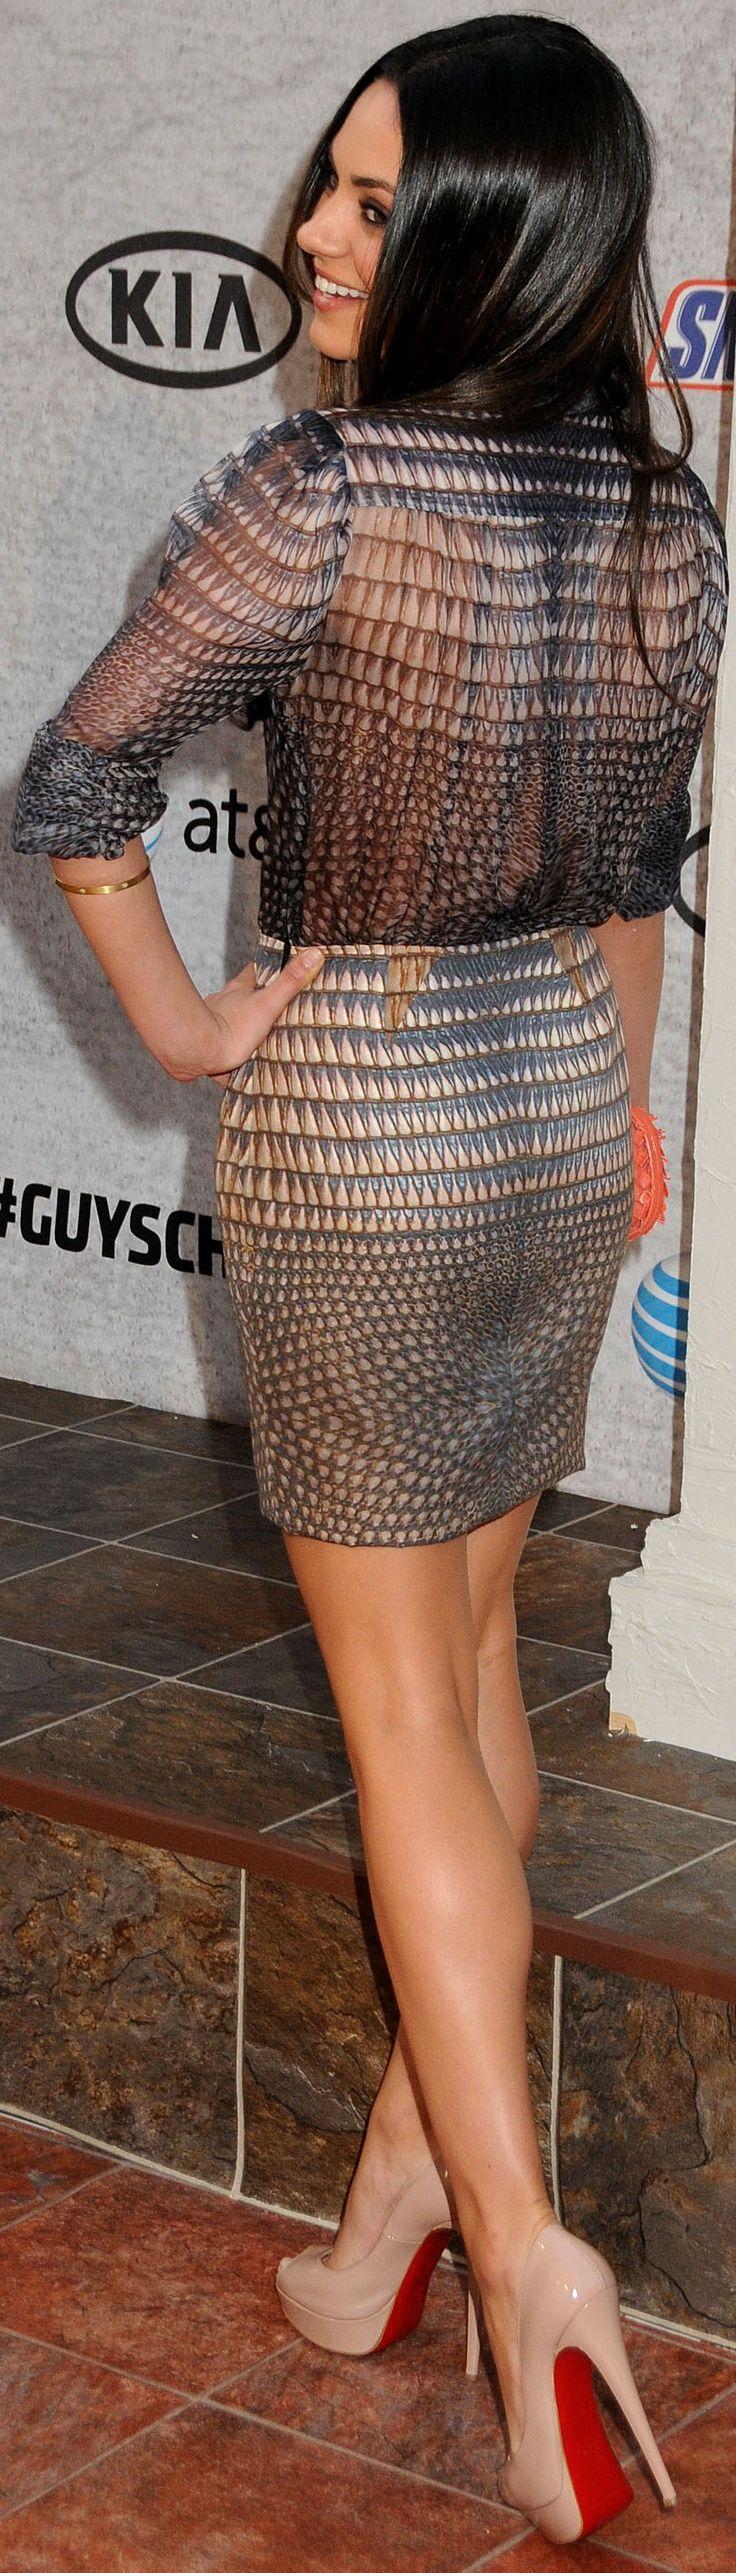 Mila Kunis #housewifehothighheels